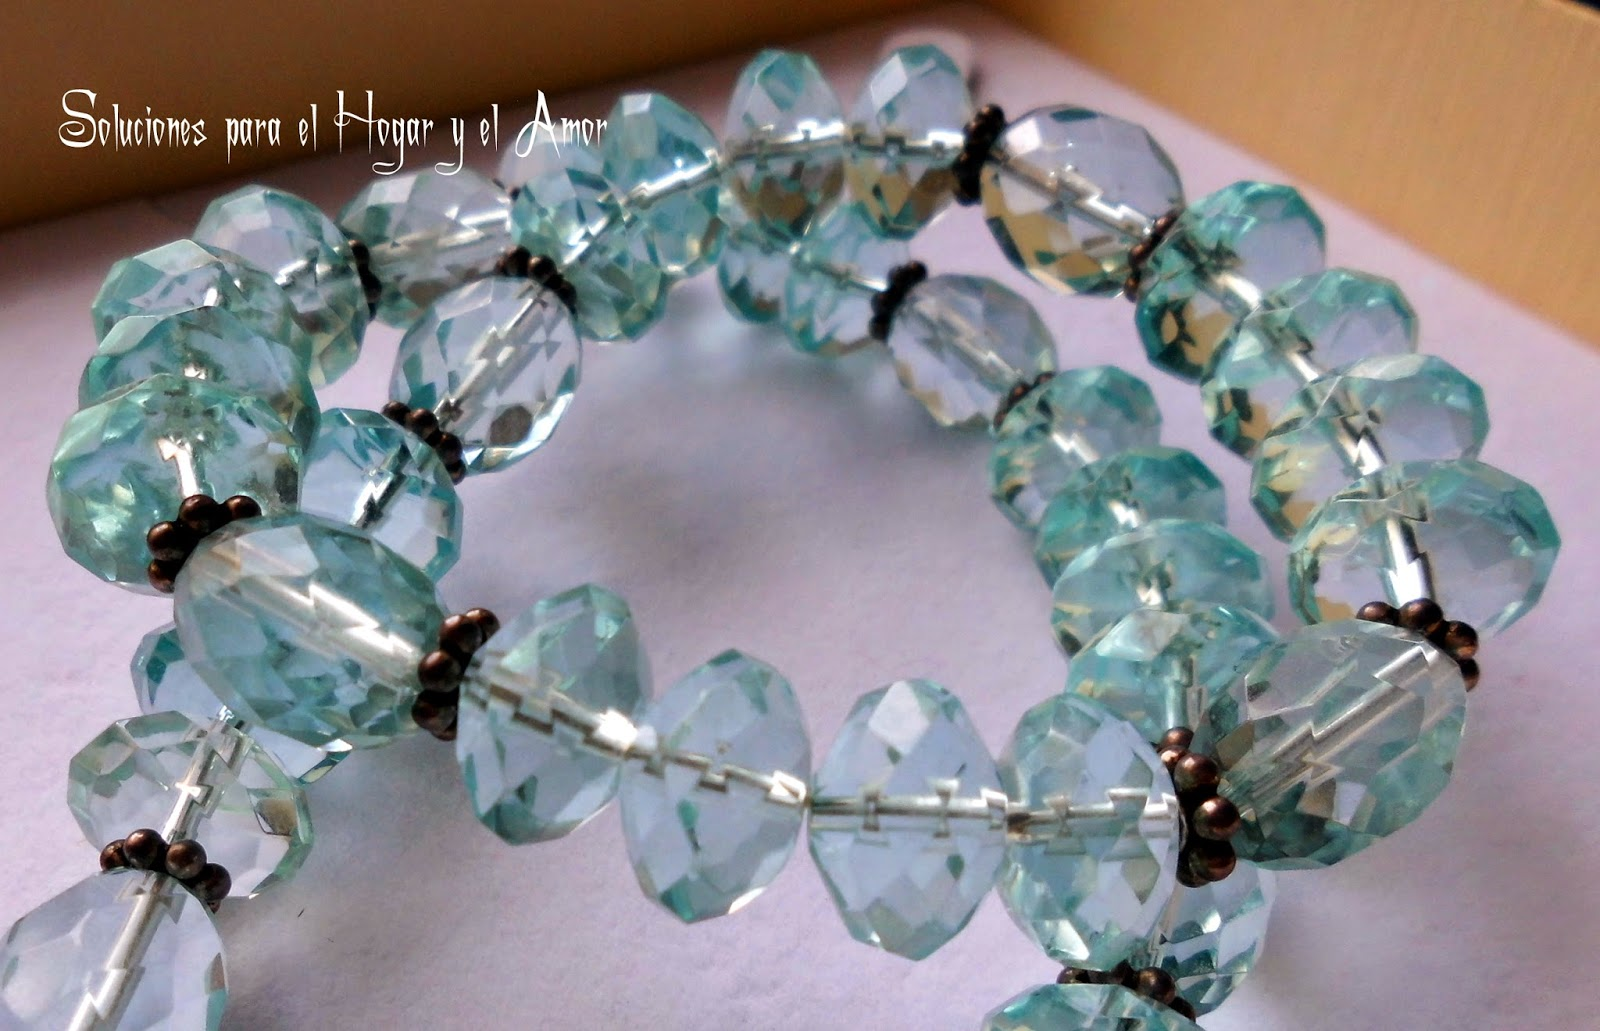 Cristales de Cuarzo azul celeste piedras facetadas, propiedades